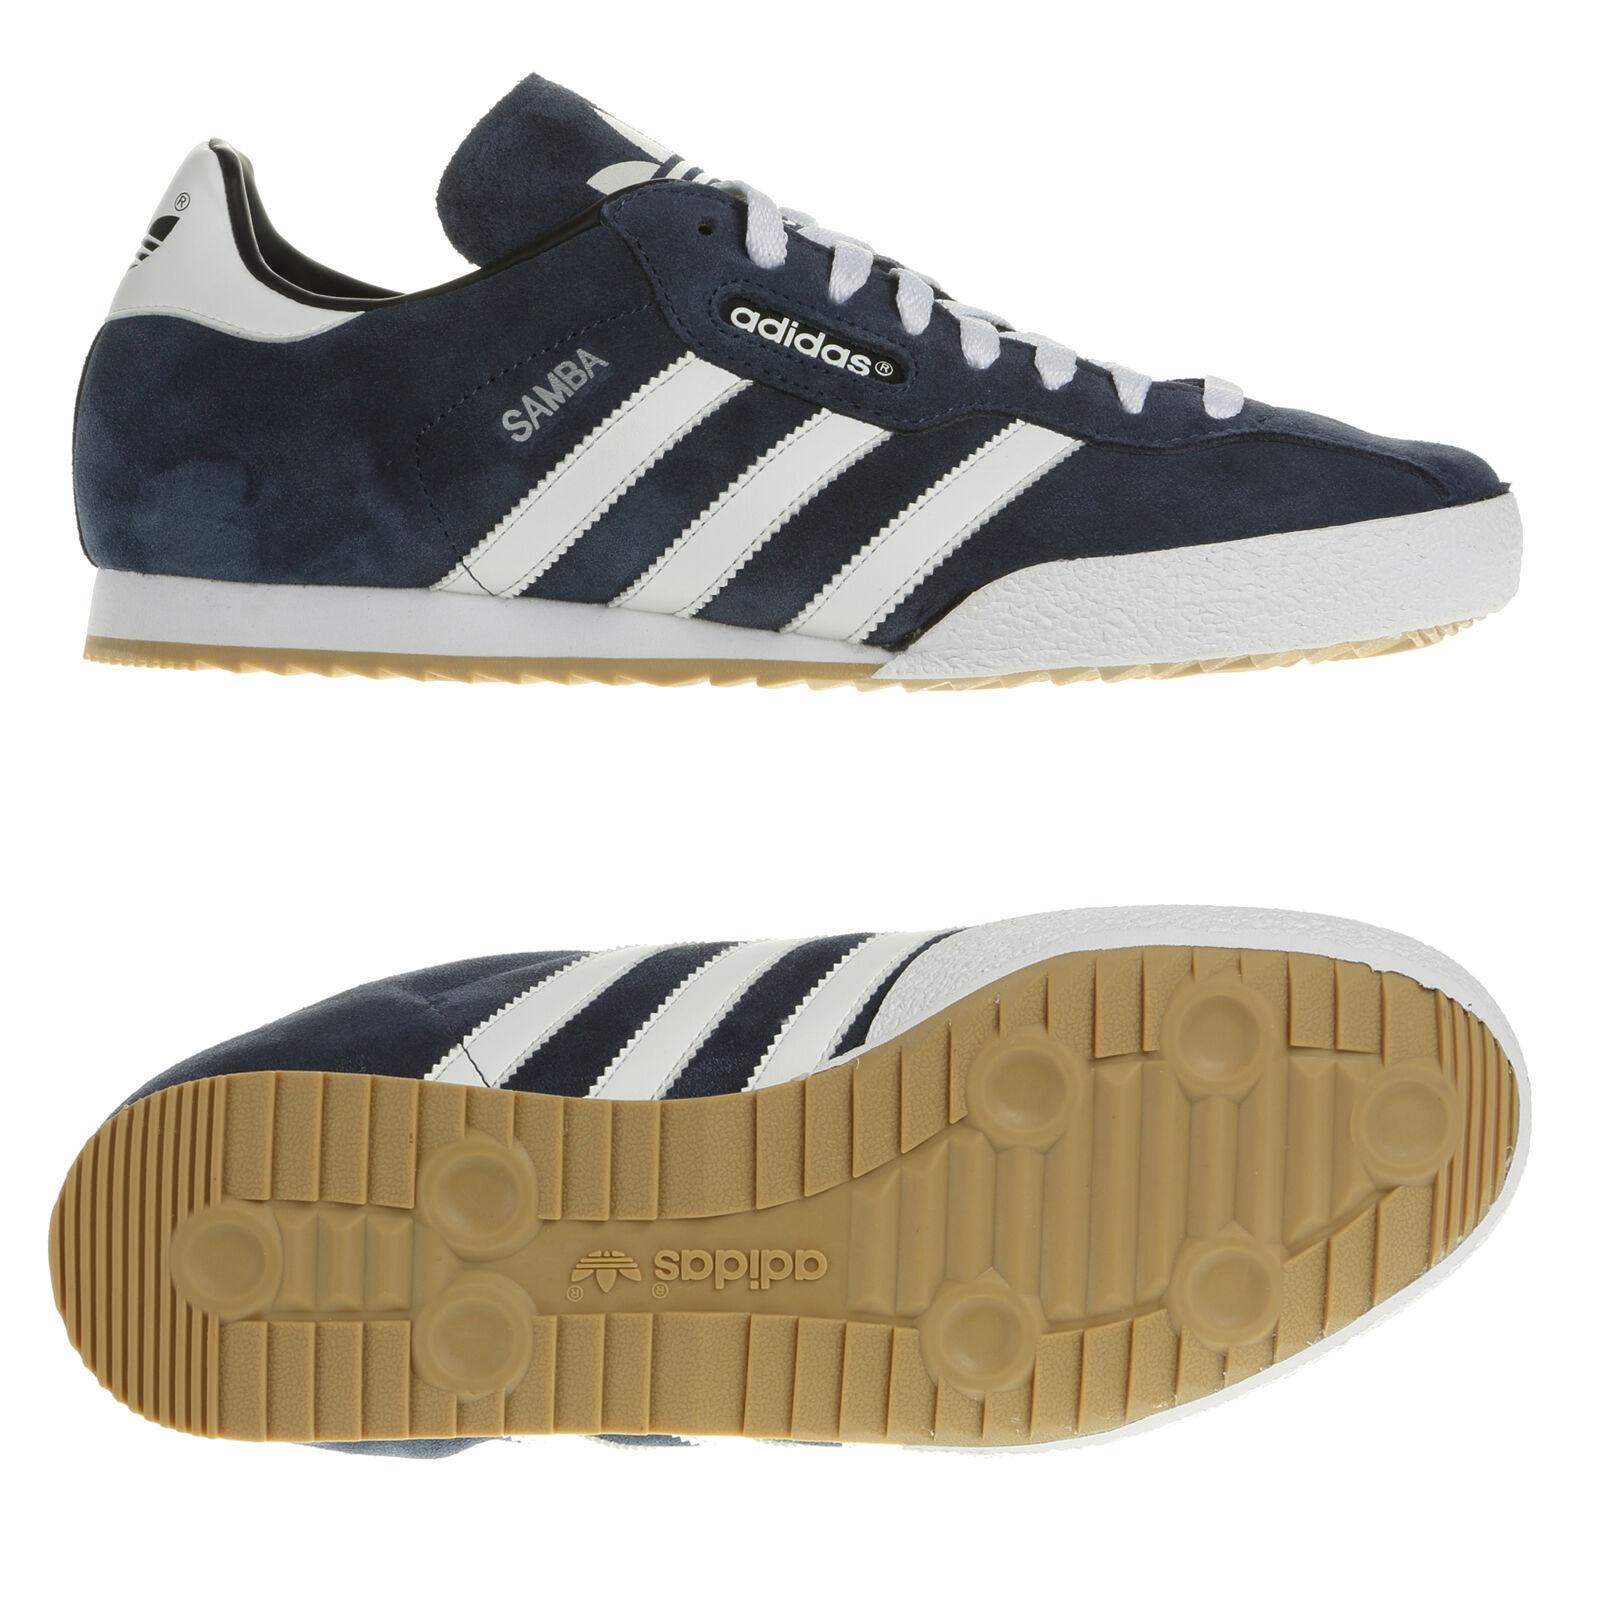 Adidas Originale Mens Samba Veloursleder Größe 7 8 8.5 9 10 11 12 Turnschuhe